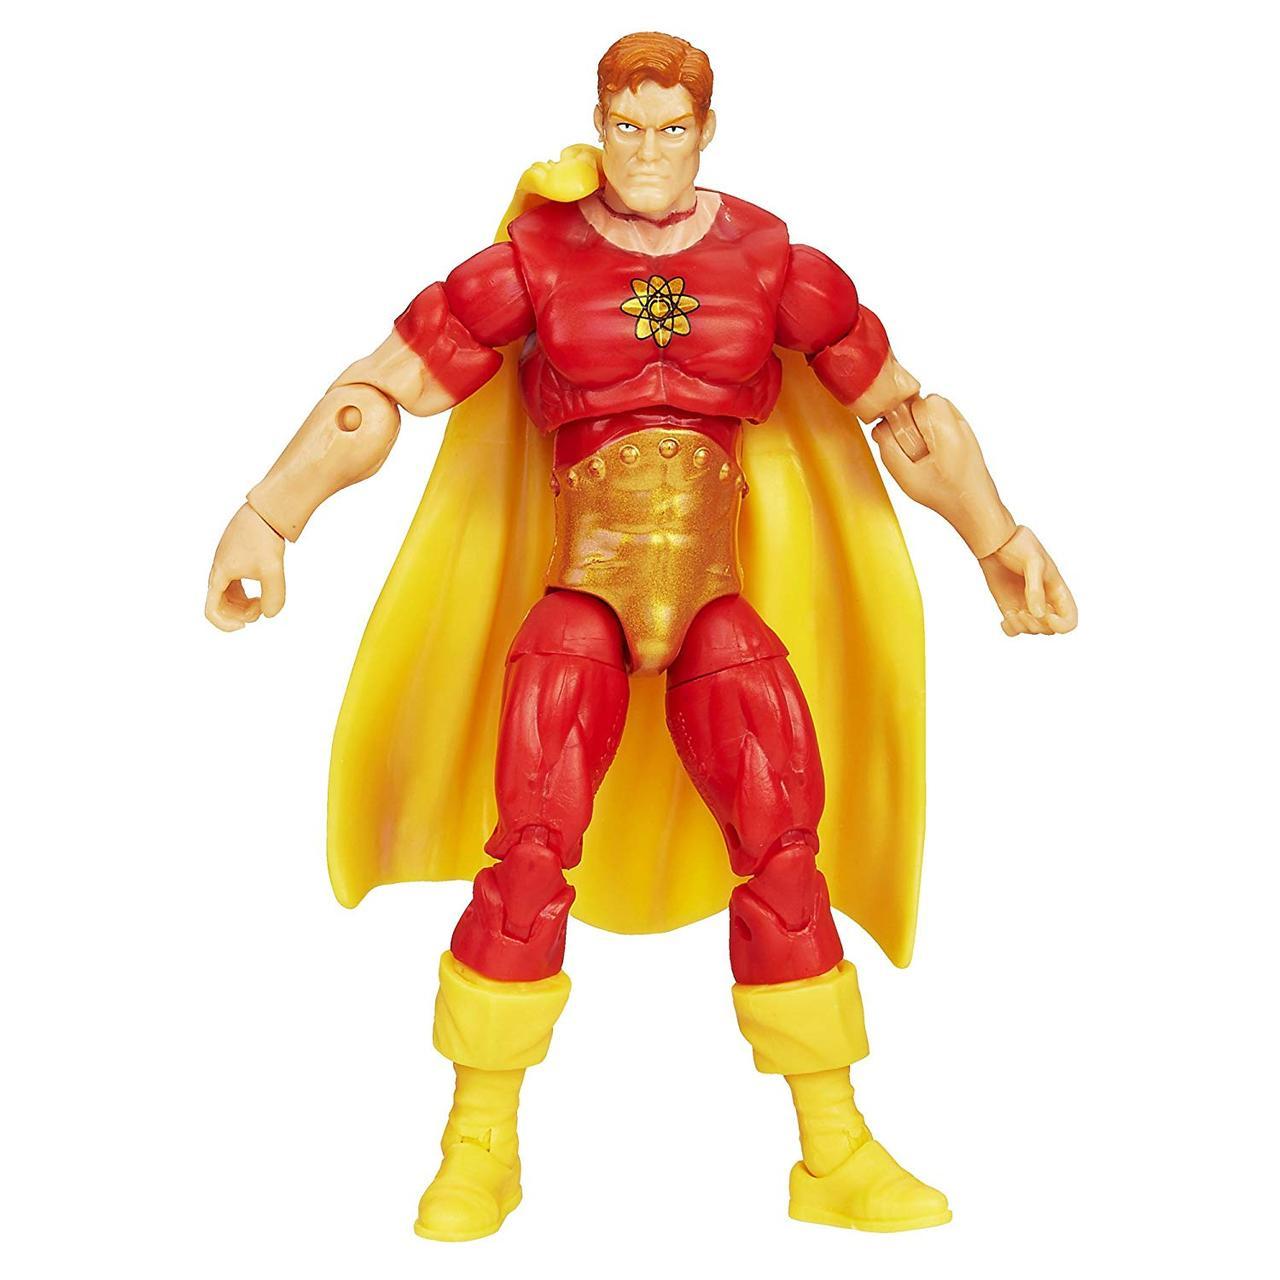 Фигурка Гиперион (Hyperion) 11 см Marvel Avengers Infinite Series (Hasbro A6753/A6749)